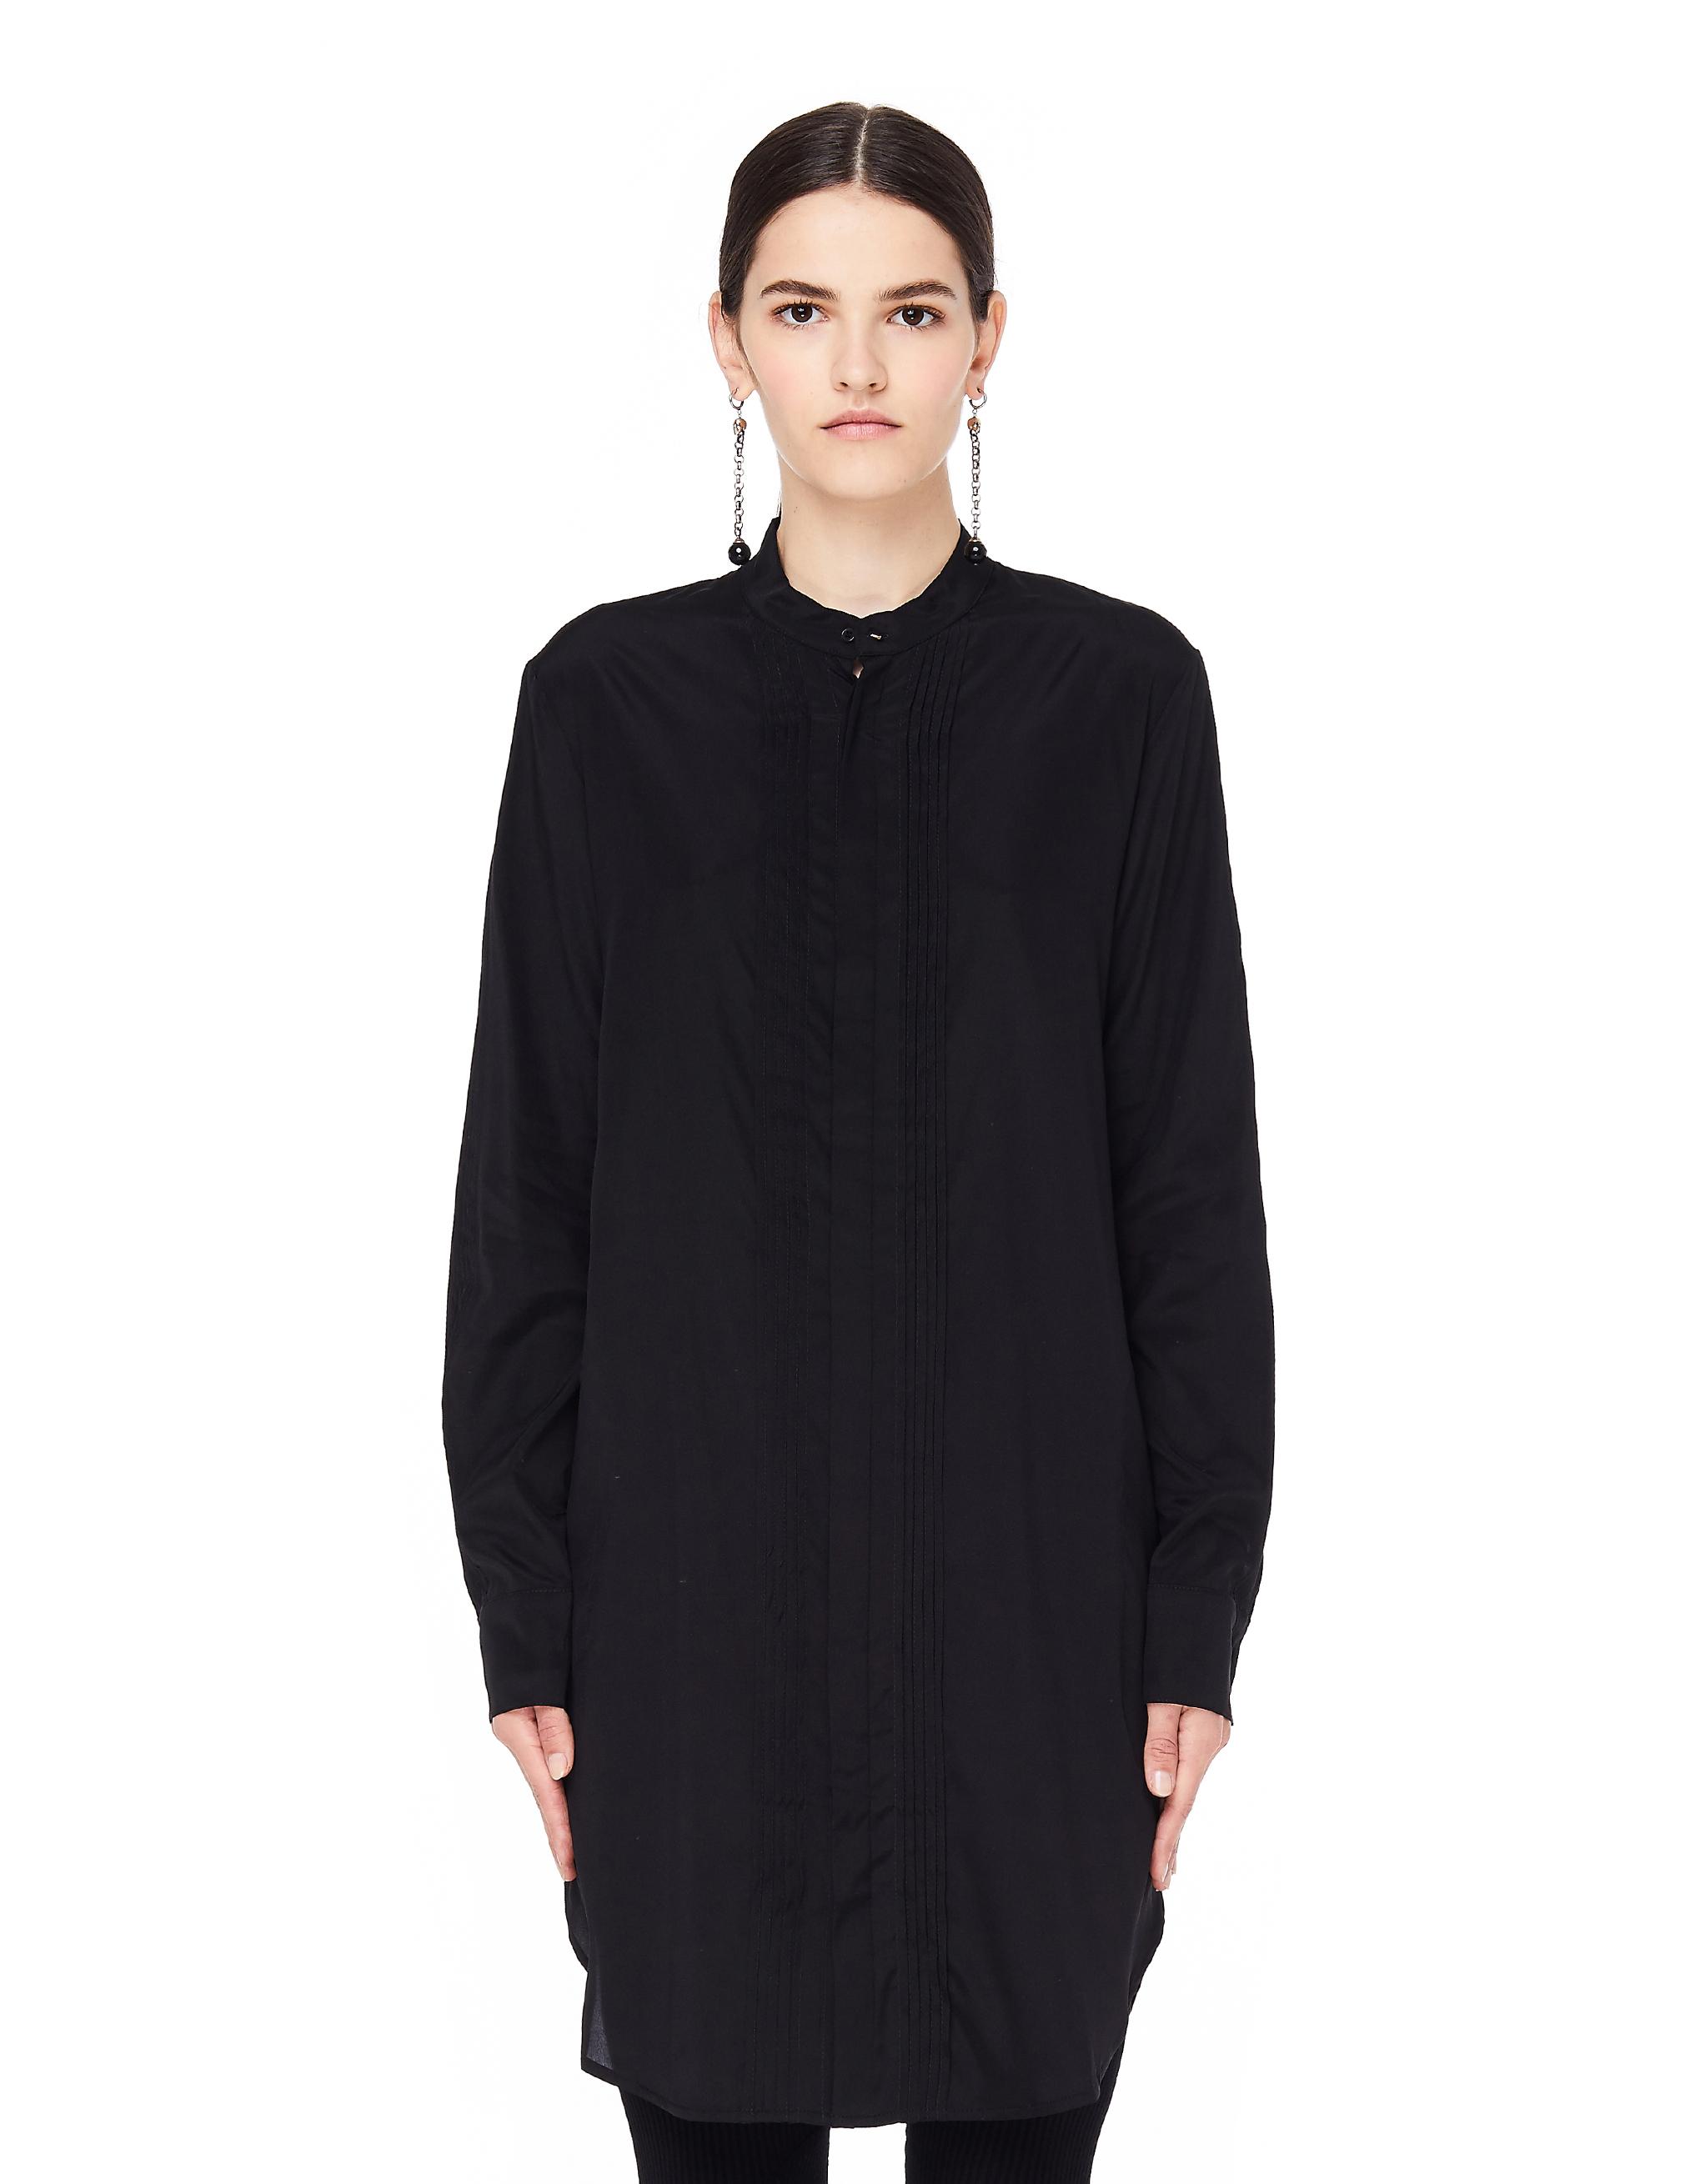 a521881991c Черная шелковая блузка Decoration A.F. Vandevorst 182decoration-001 ...